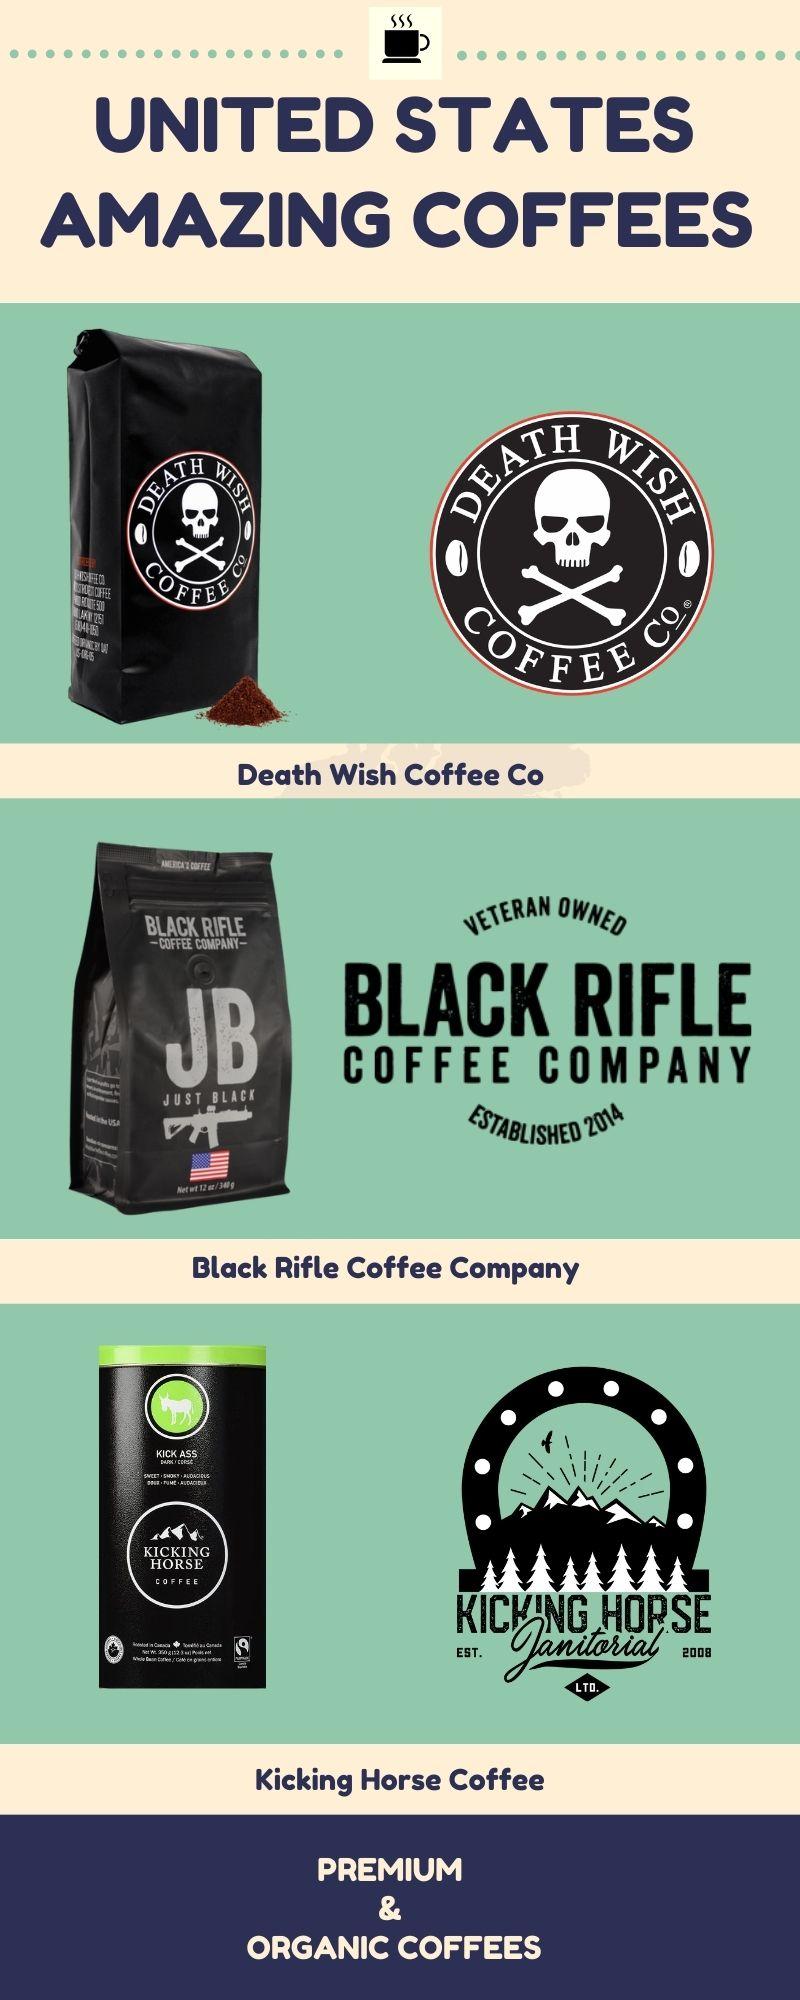 Premium & Organic Coffees - Black Rifle Coffee company - Death Wish Coffee - Kicking Horse #Coffe